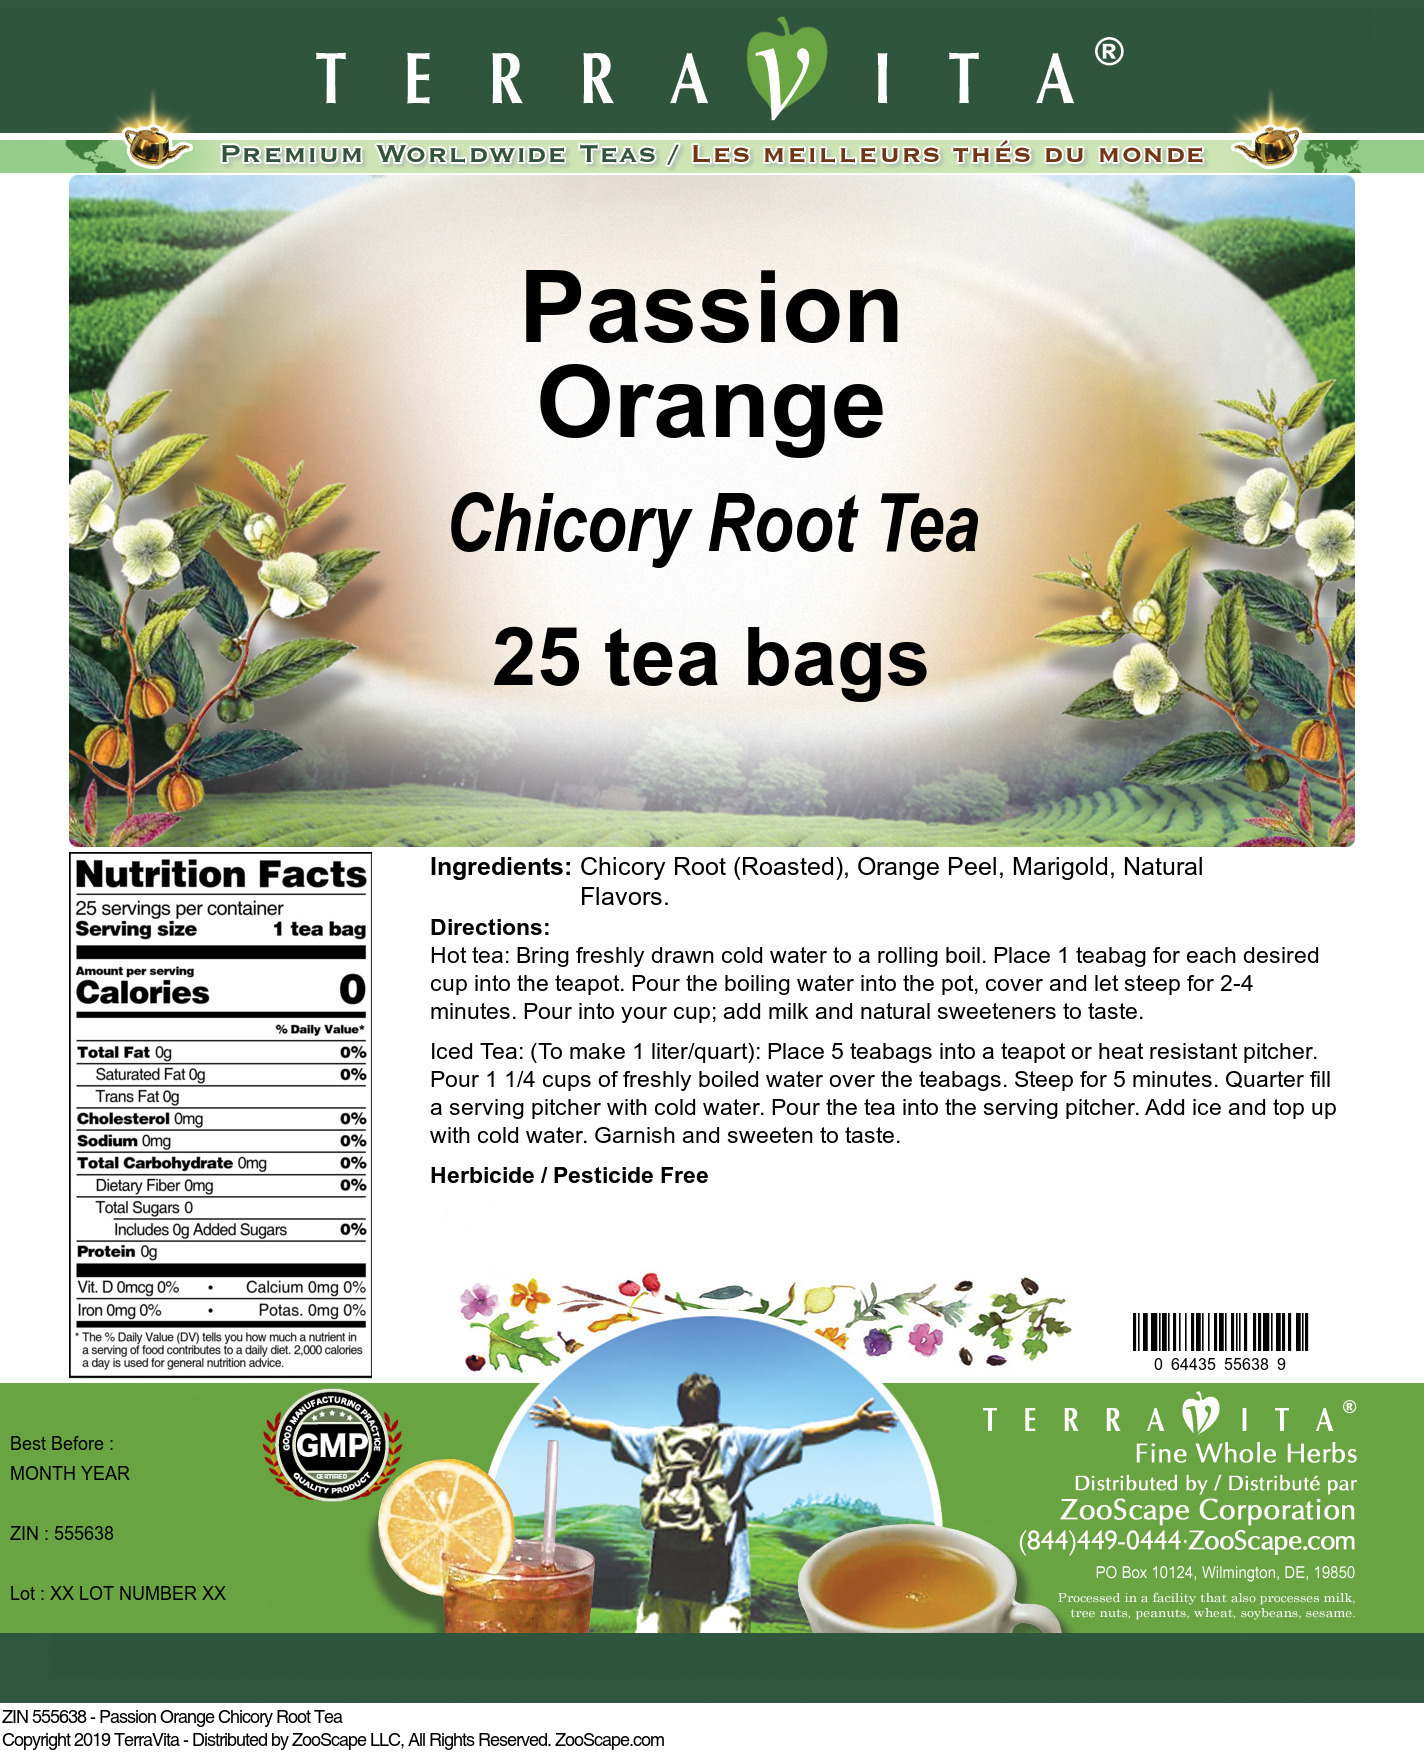 Passion Orange Chicory Root Tea